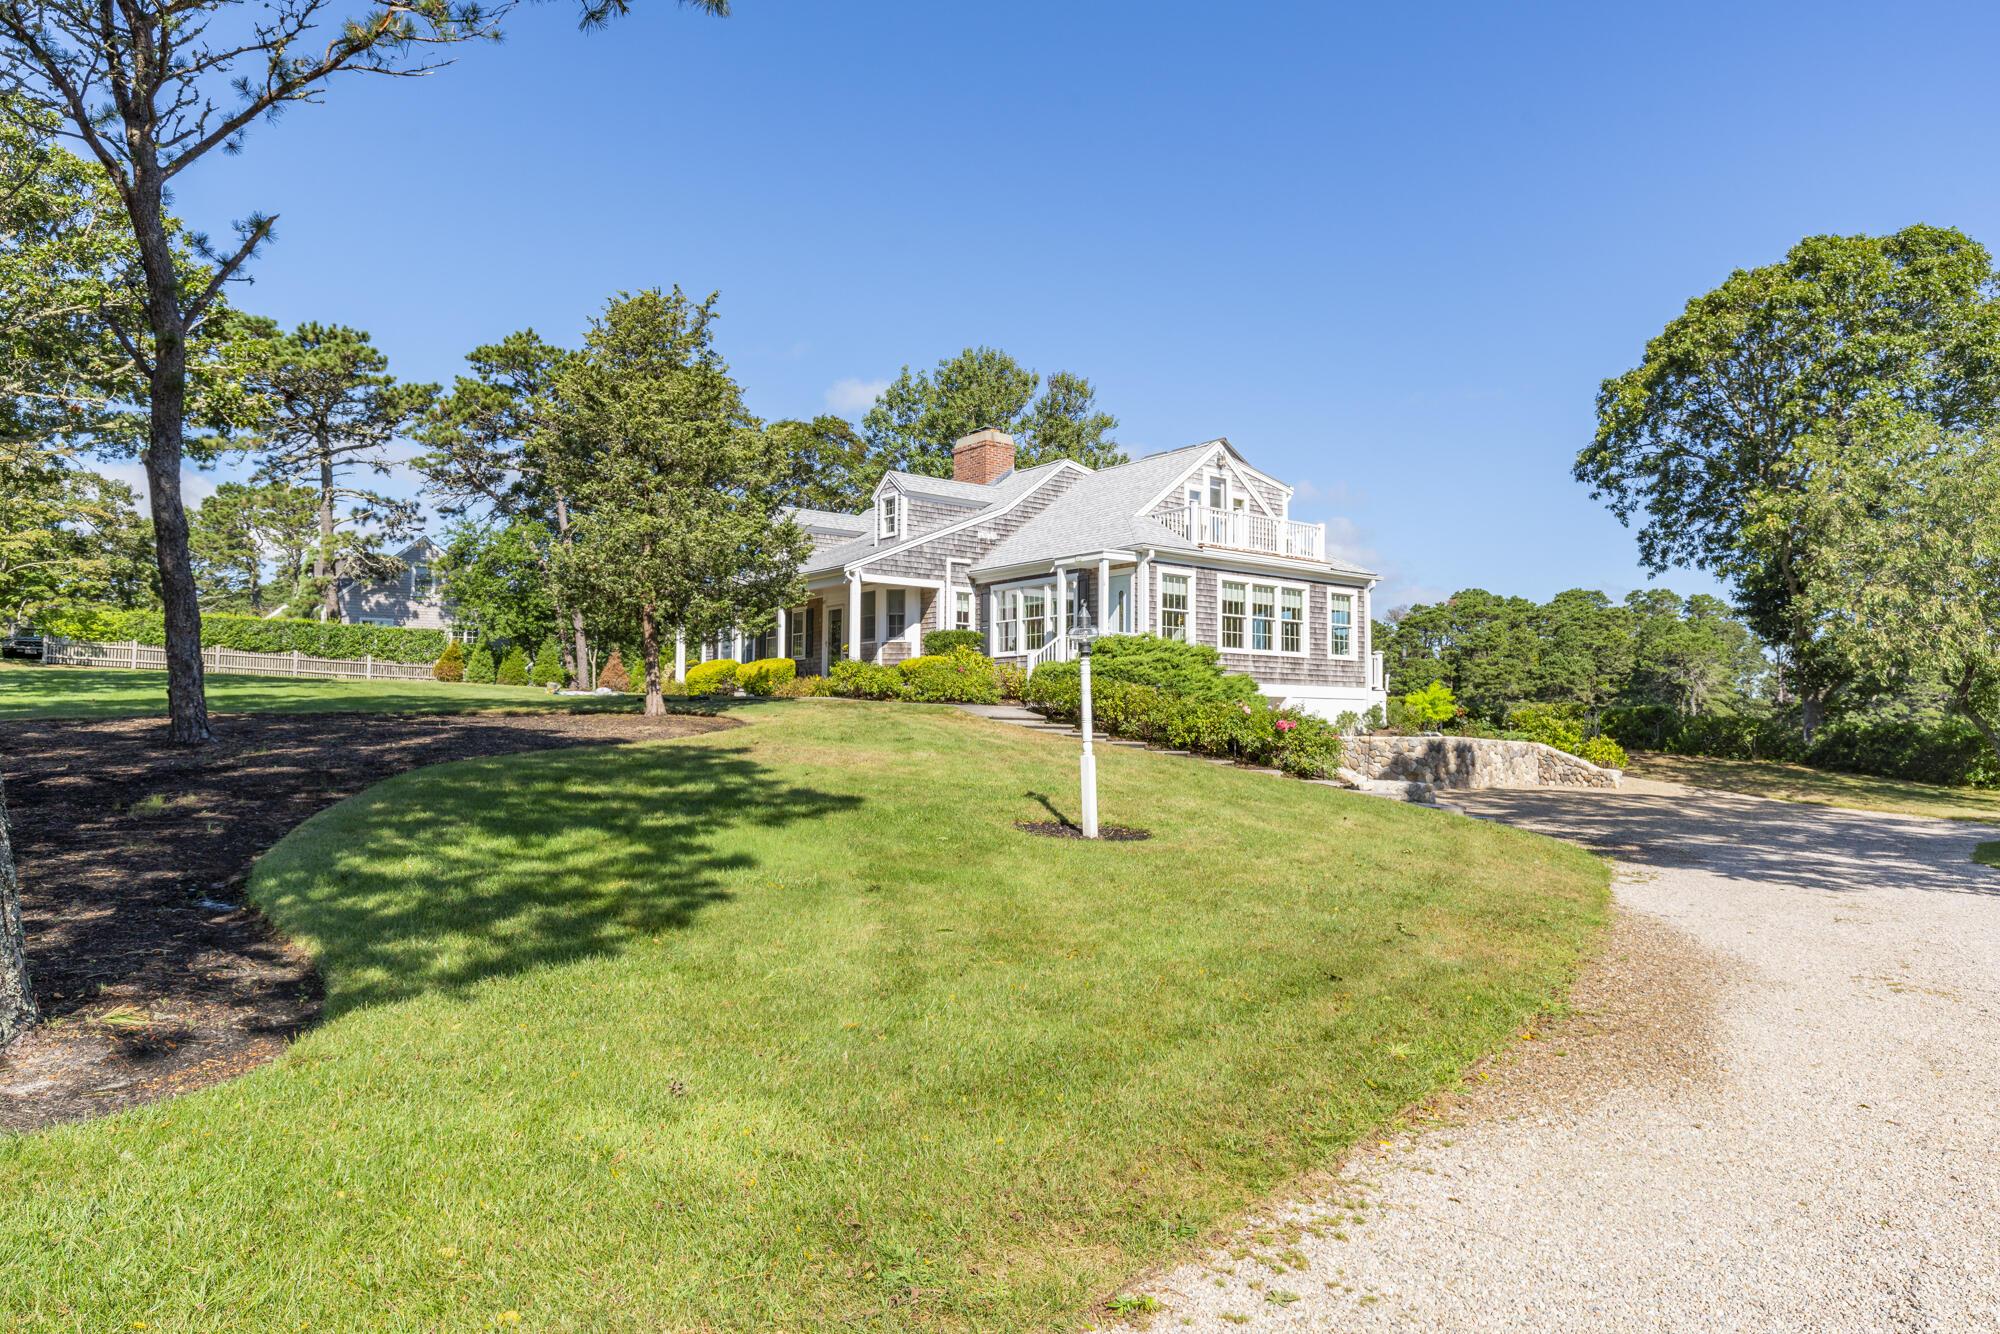 69 Strong Island Road, Chatham, MA  02633 - slide 39